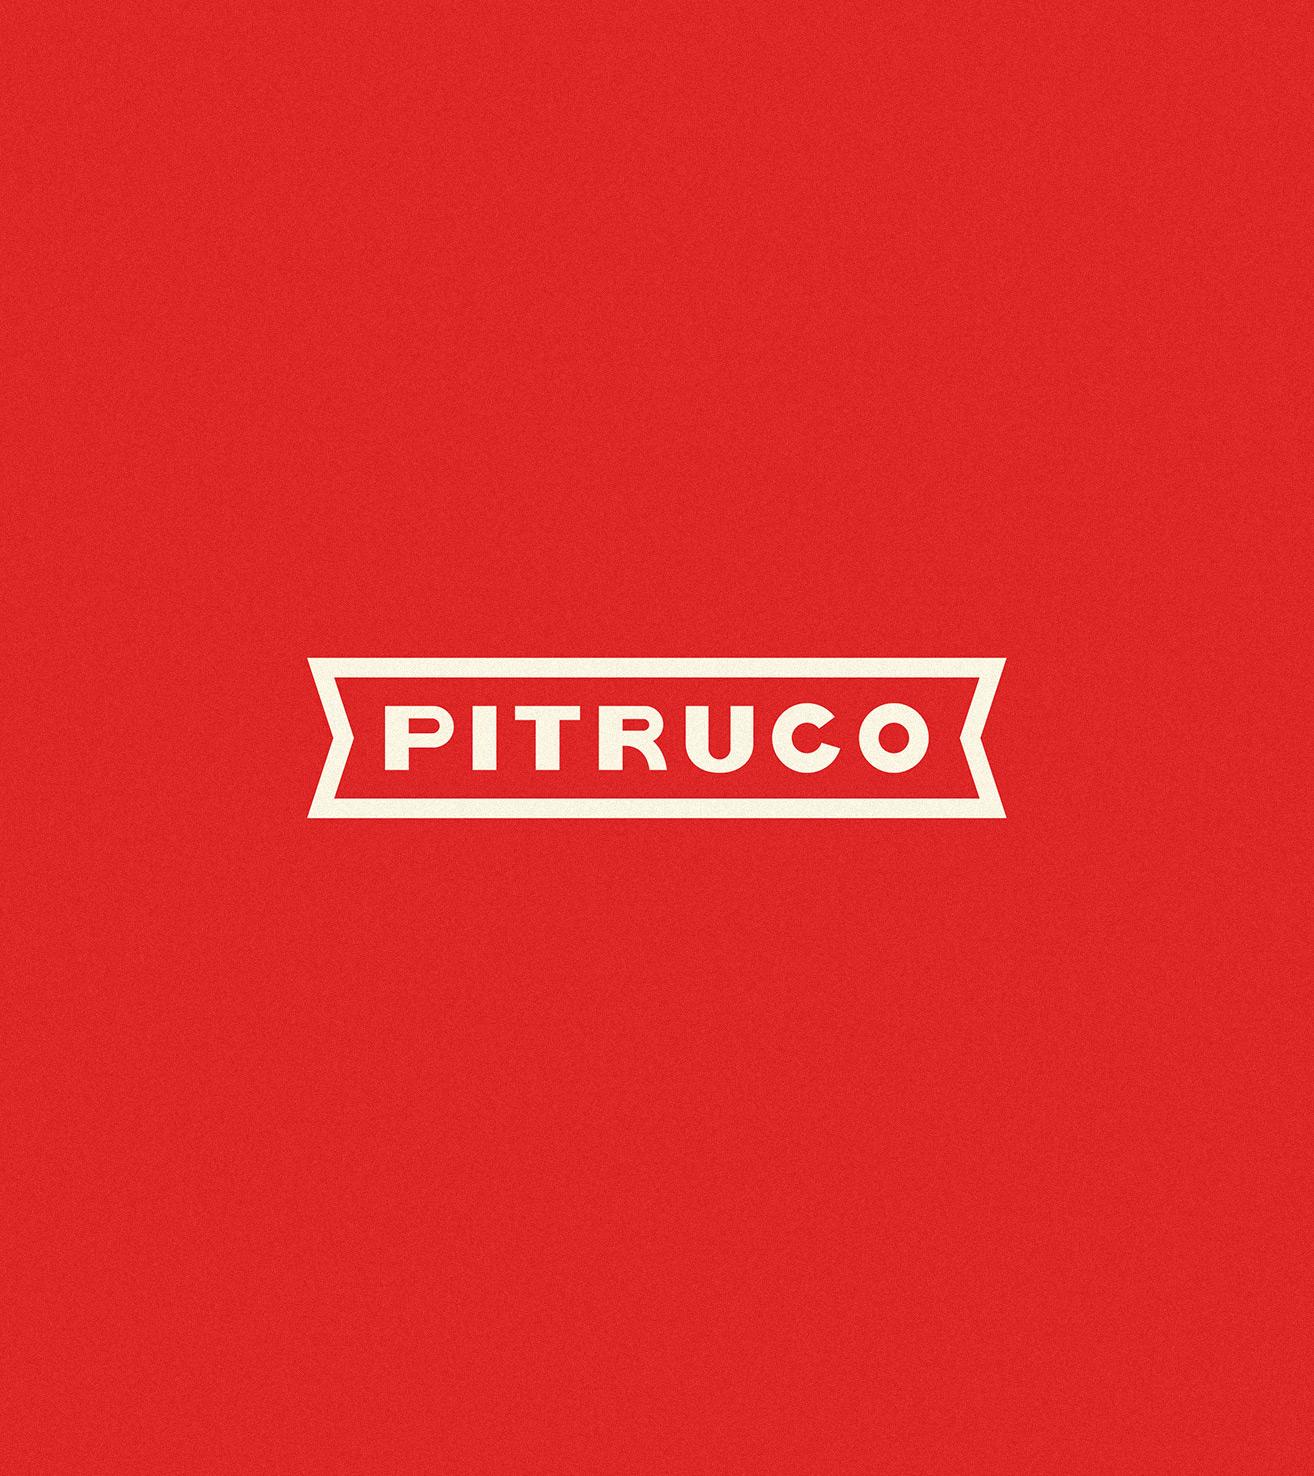 MGS_Pitruco_015